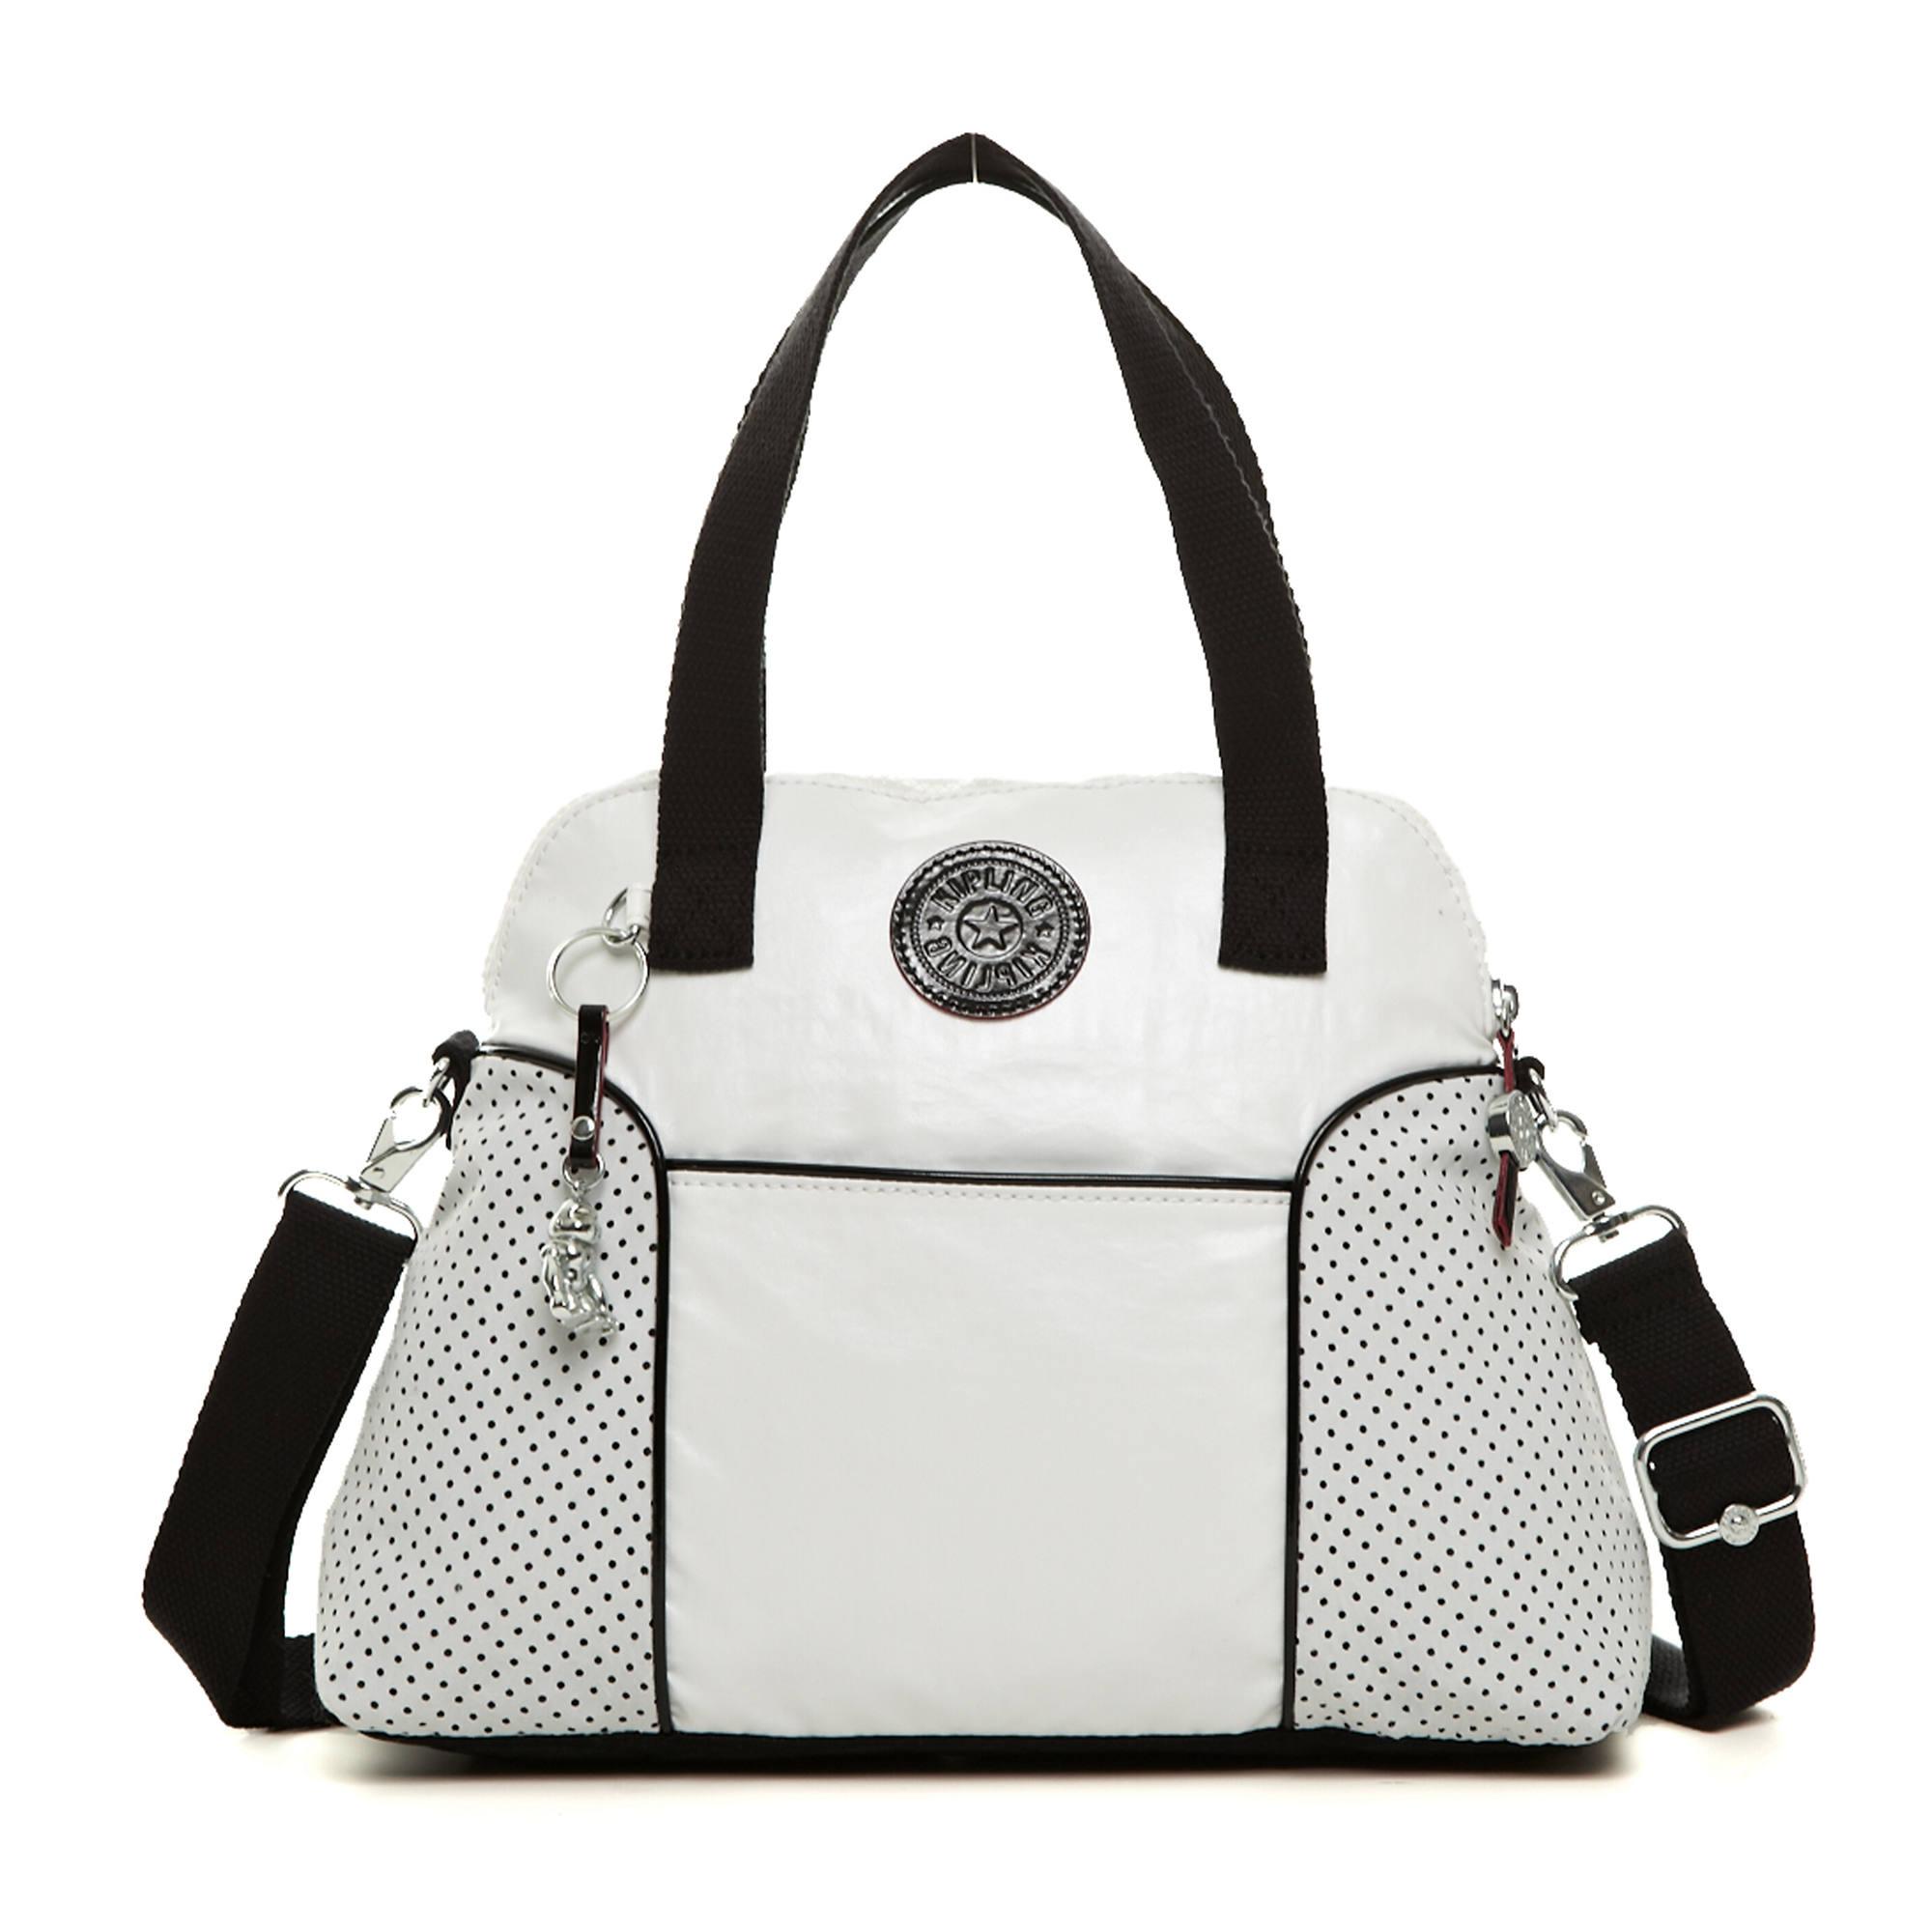 d19e4f550c Pahneiro Perforated Bag,Alabaster Classic,large